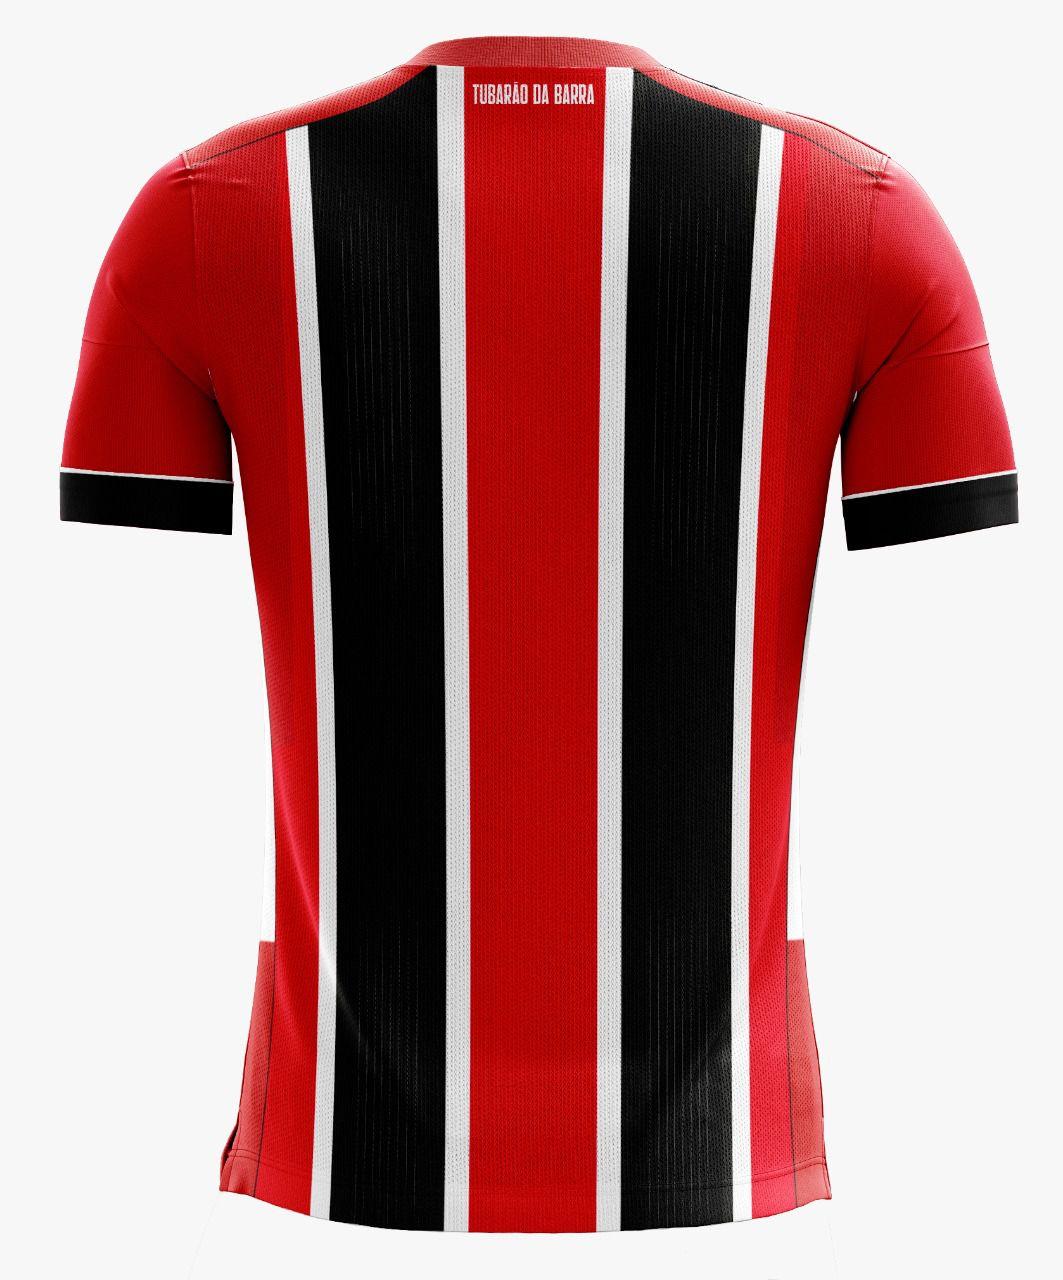 Camisa Uniforme 02 MASCULINA sem  patrocínio REF.1008119 (2019)